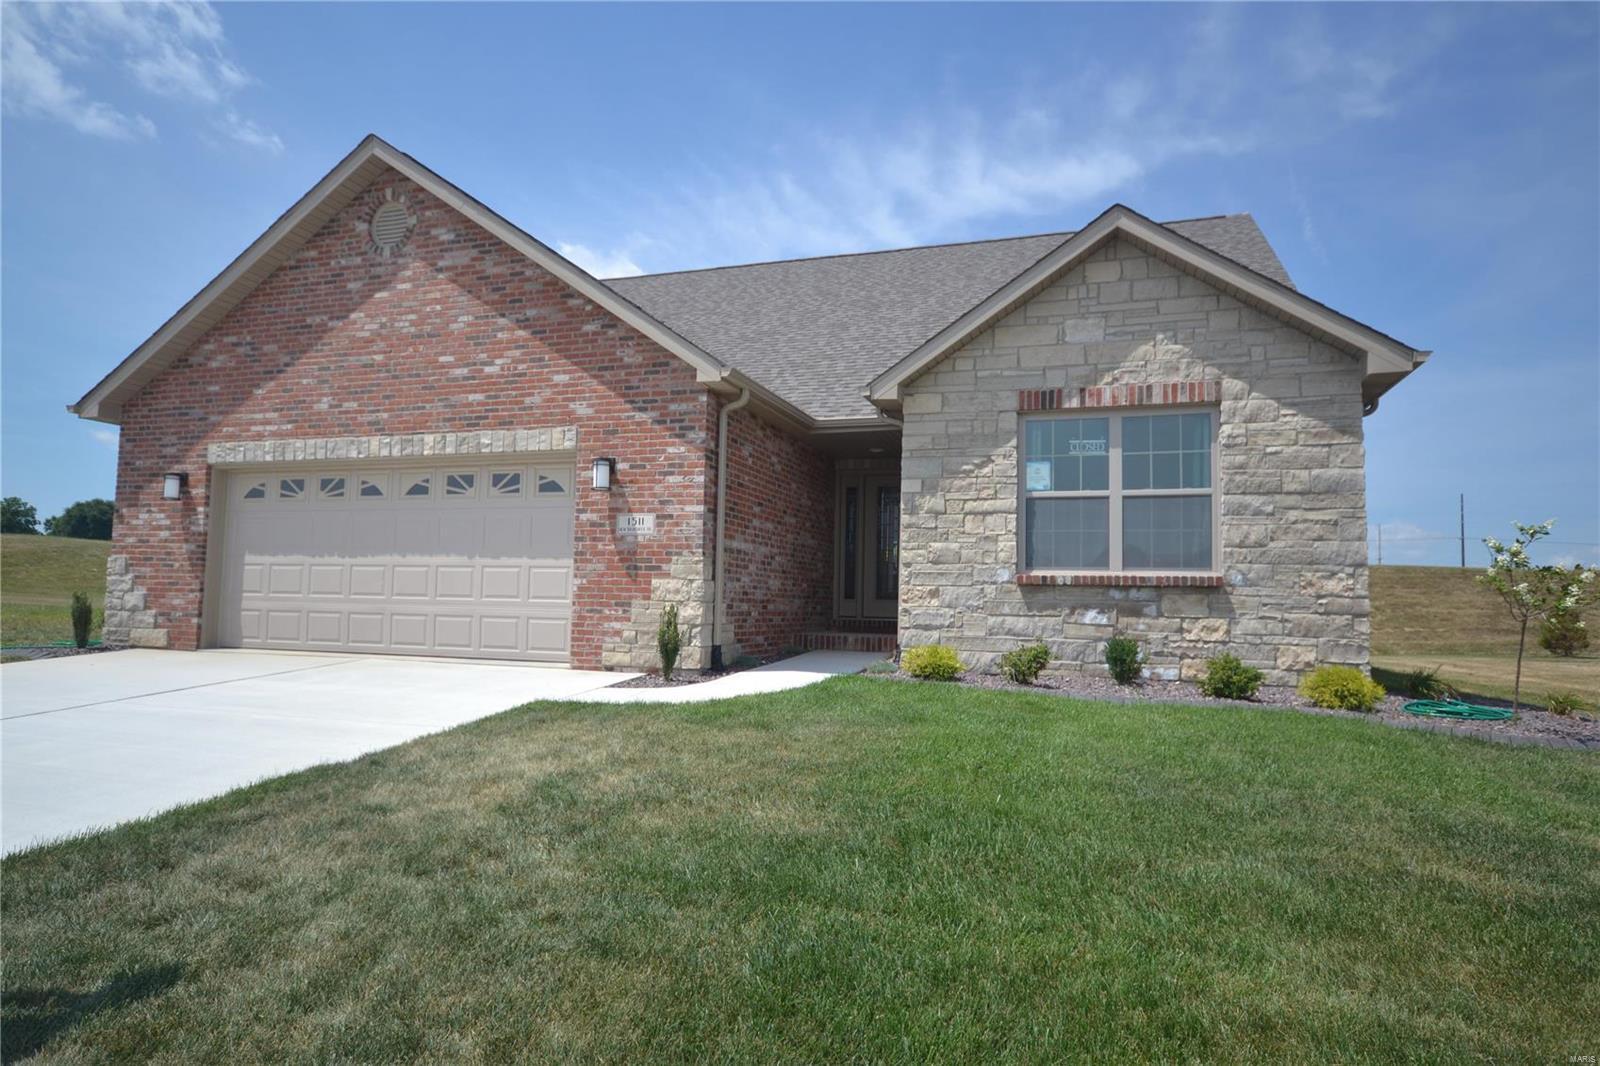 4416 TBB Devin Drive Property Photo - Smithton, IL real estate listing